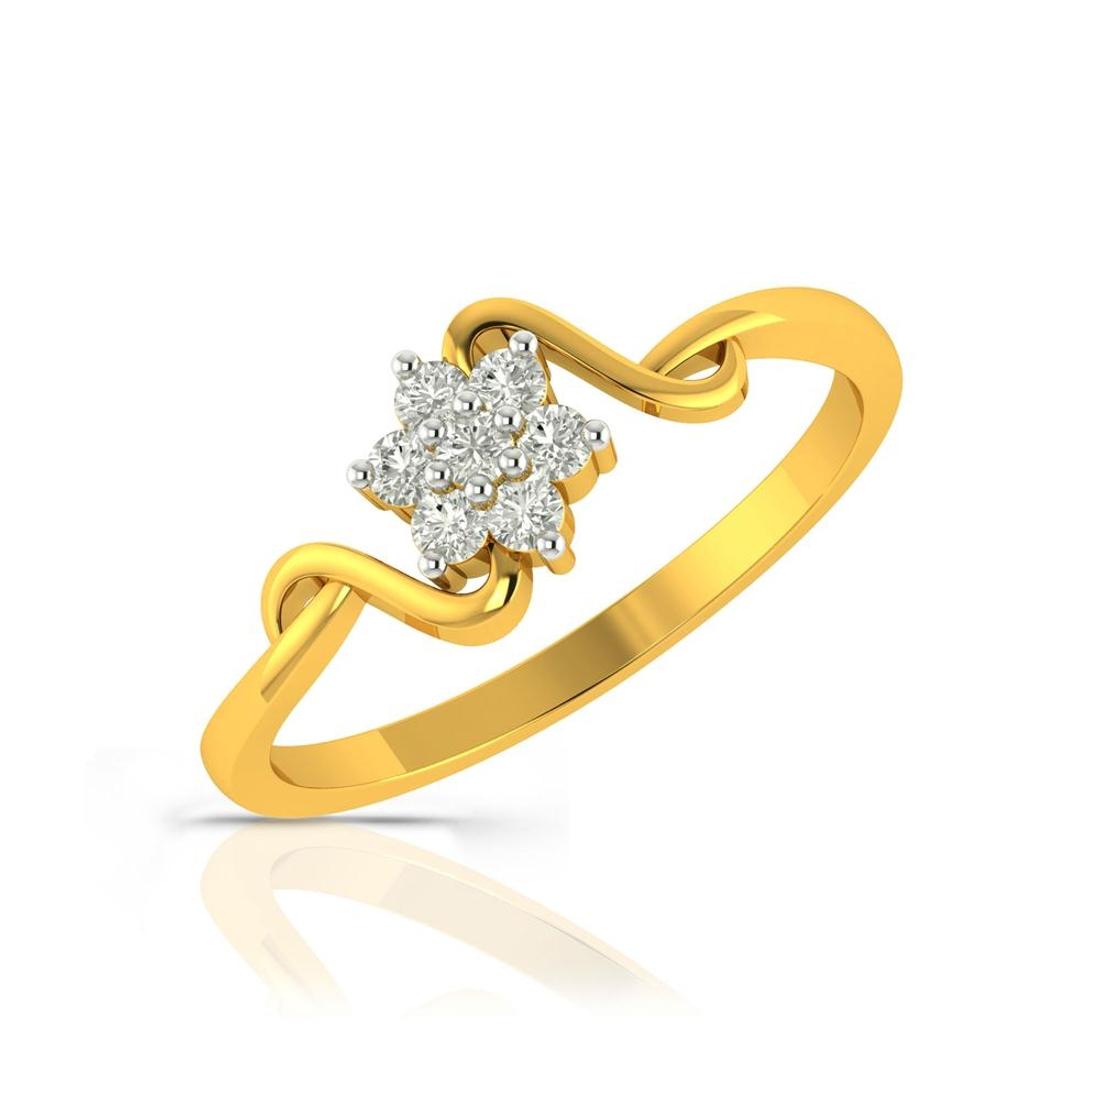 Buy Charu Jewels Diamond Ladies Ring CJLR0140 Online in India